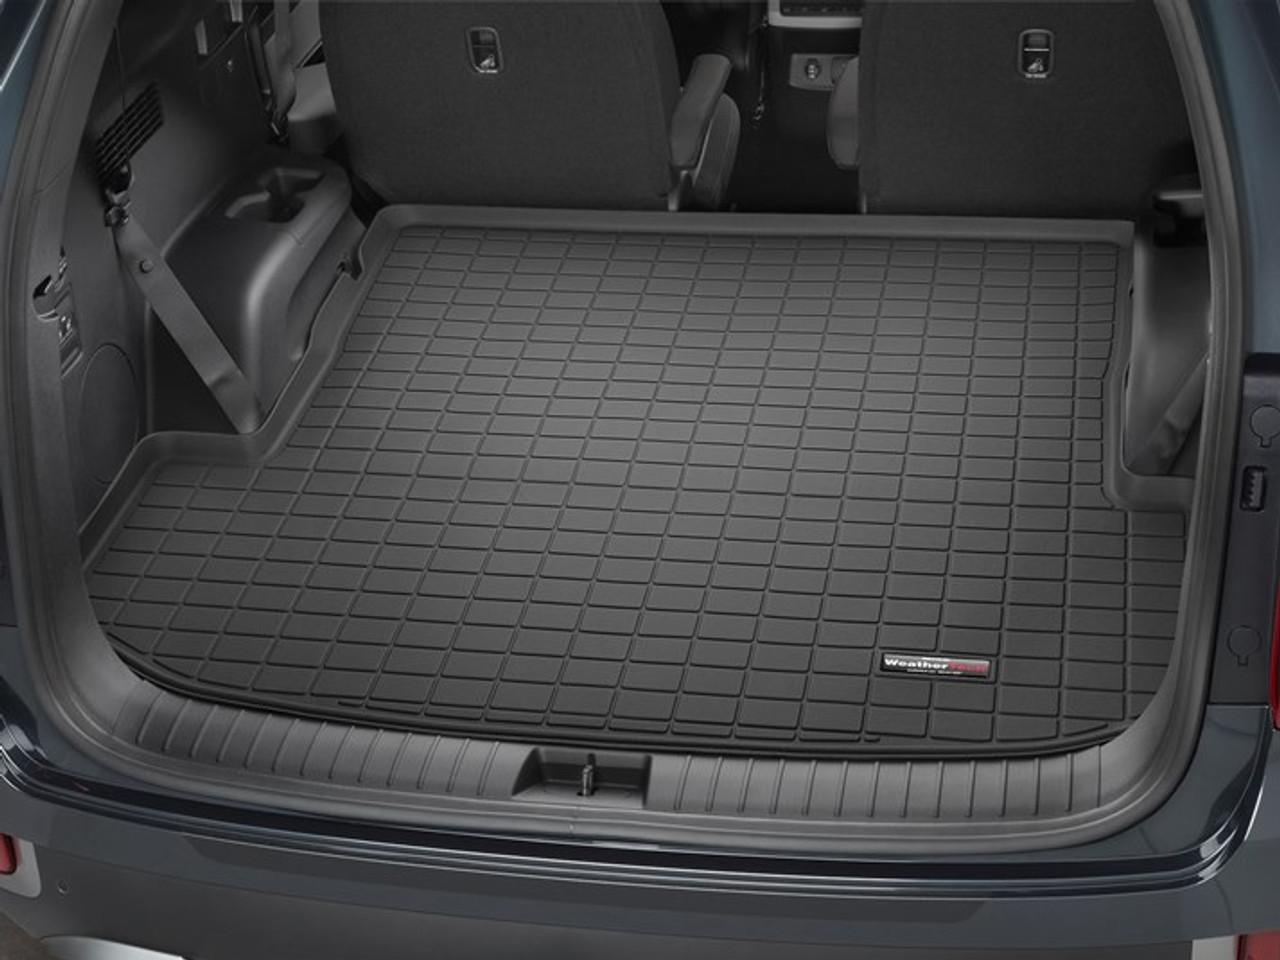 2020-2022 Hyundai Palisade WeatherTech Cargo Liner - Behind 2nd Row (Black)